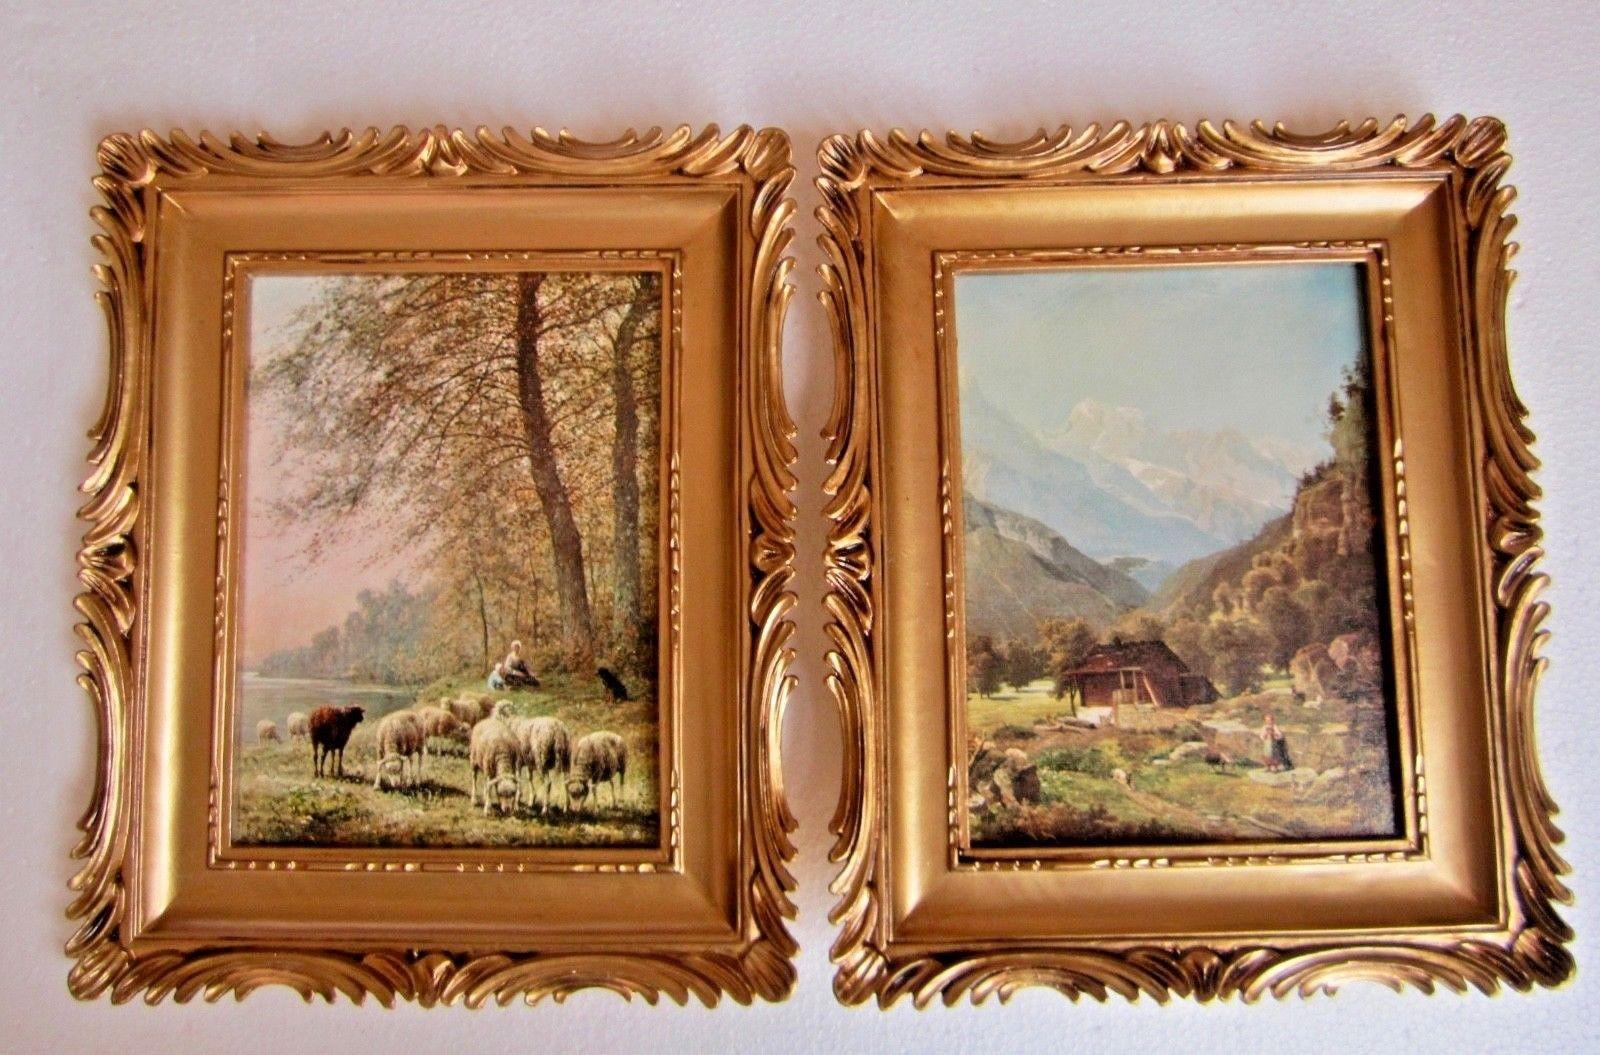 Bilderrahmen Gemälde Landschaft Schaf Schäfer 33x28 Antik BAROCK ...